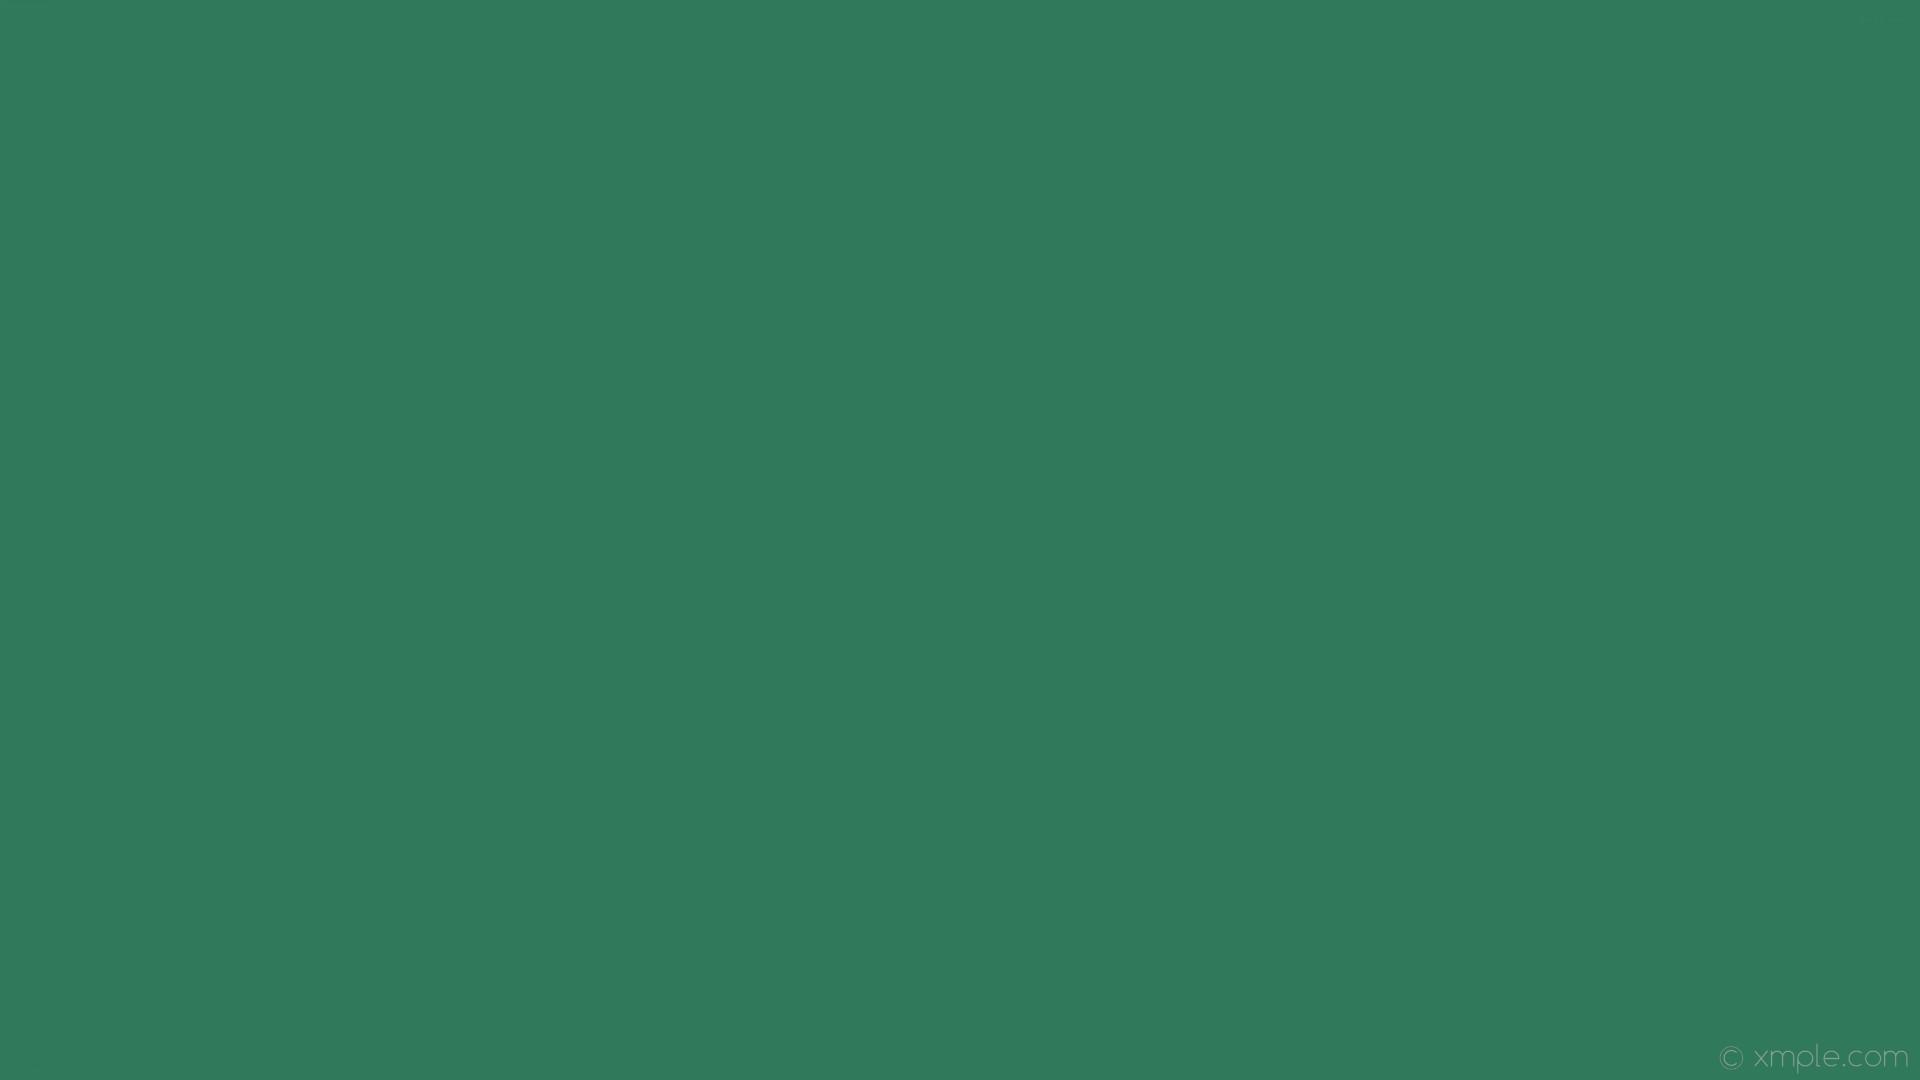 wallpaper plain single one colour turquoise solid color #30795a